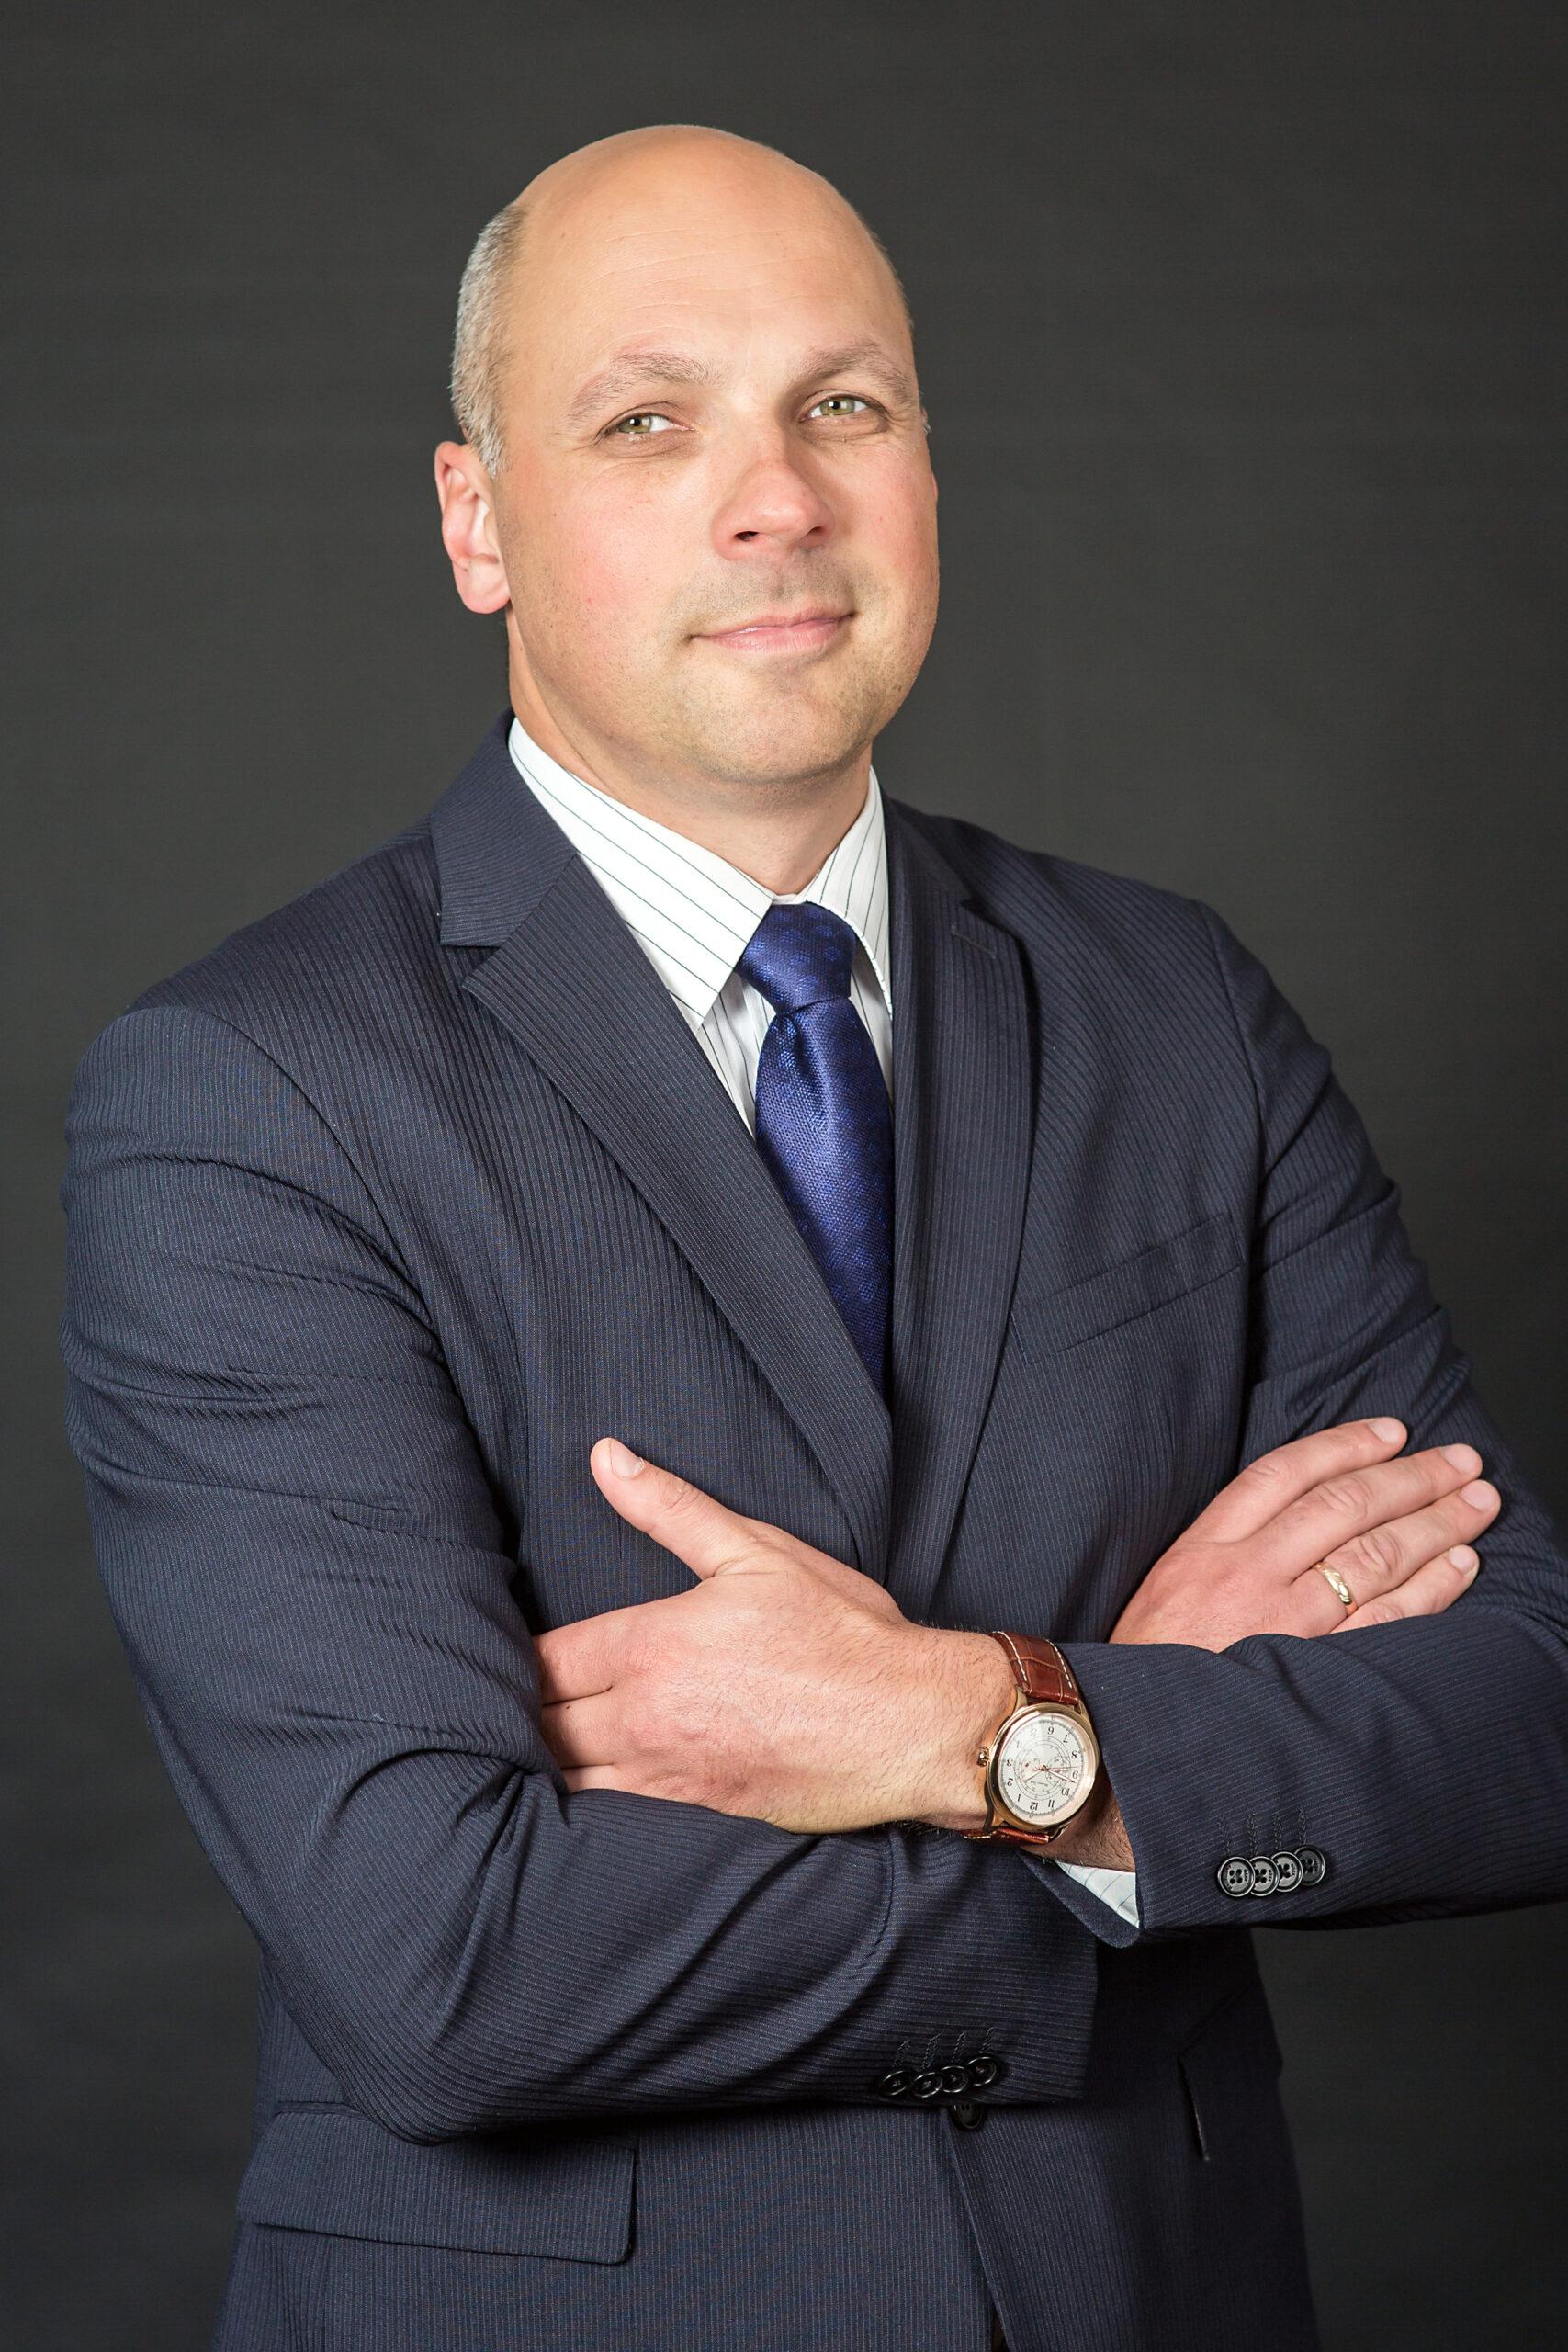 Mindaugas Martinaitis